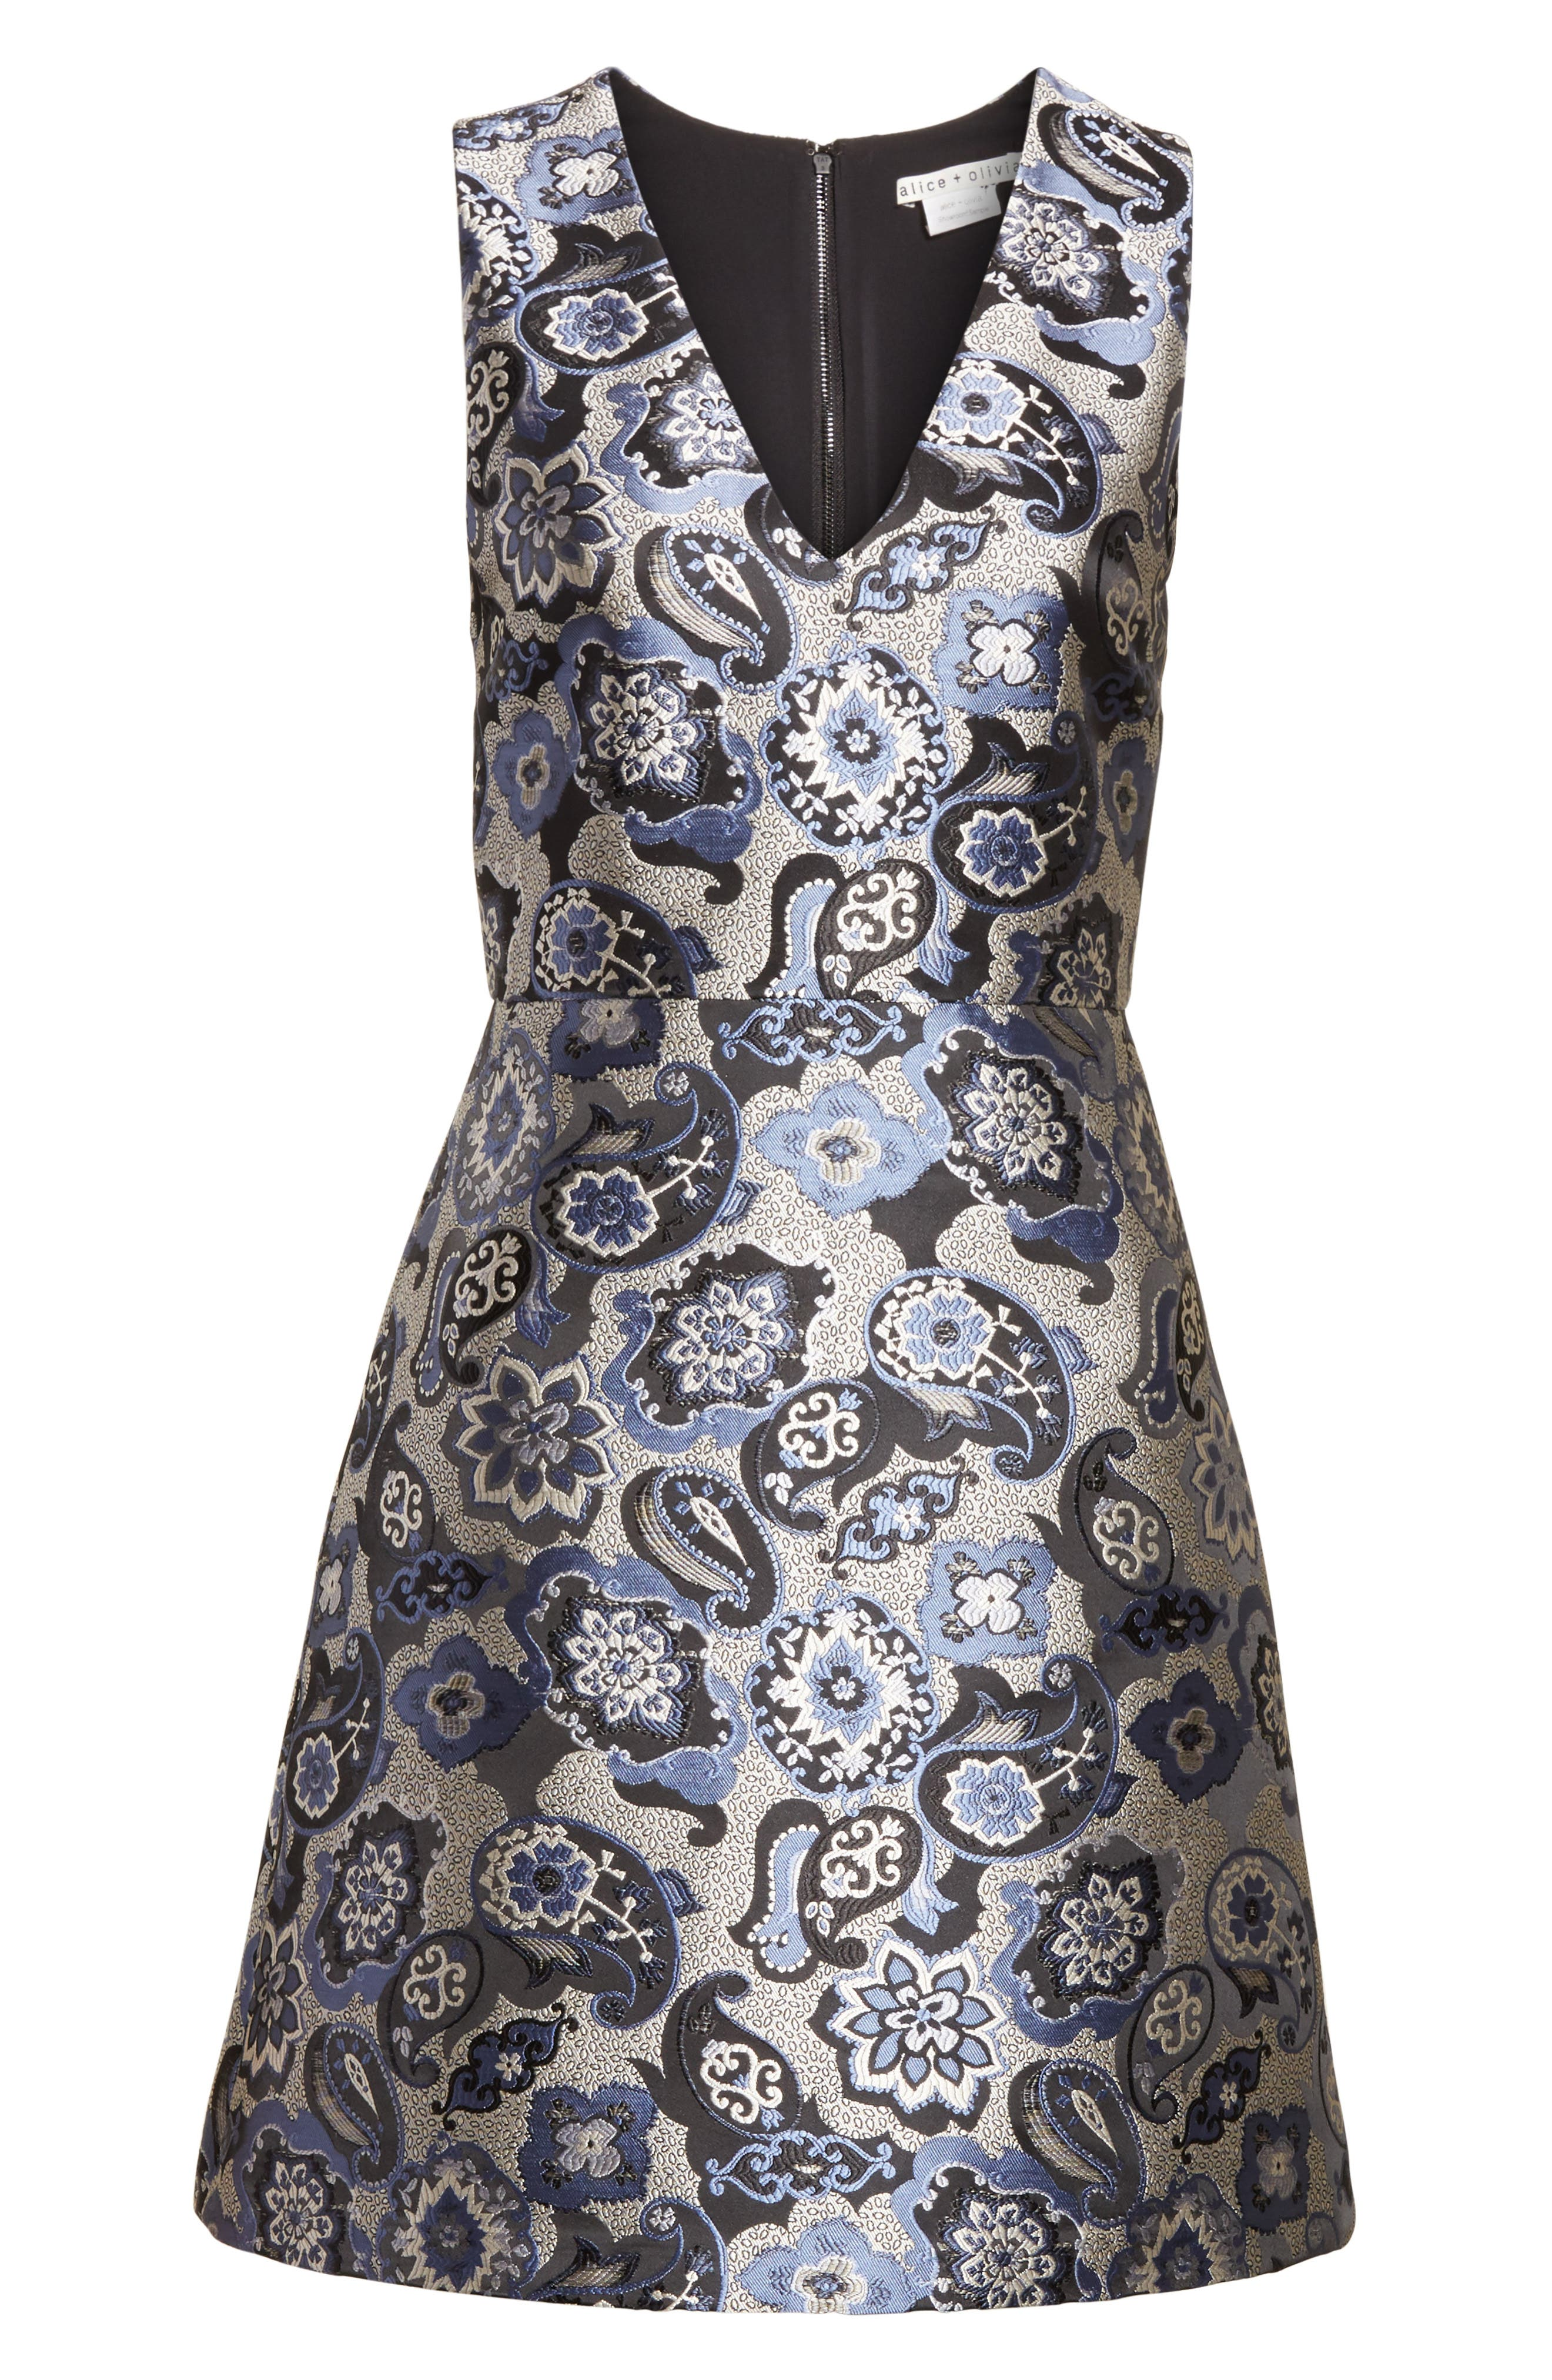 Malin V-Neck Dress,                             Alternate thumbnail 6, color,                             499